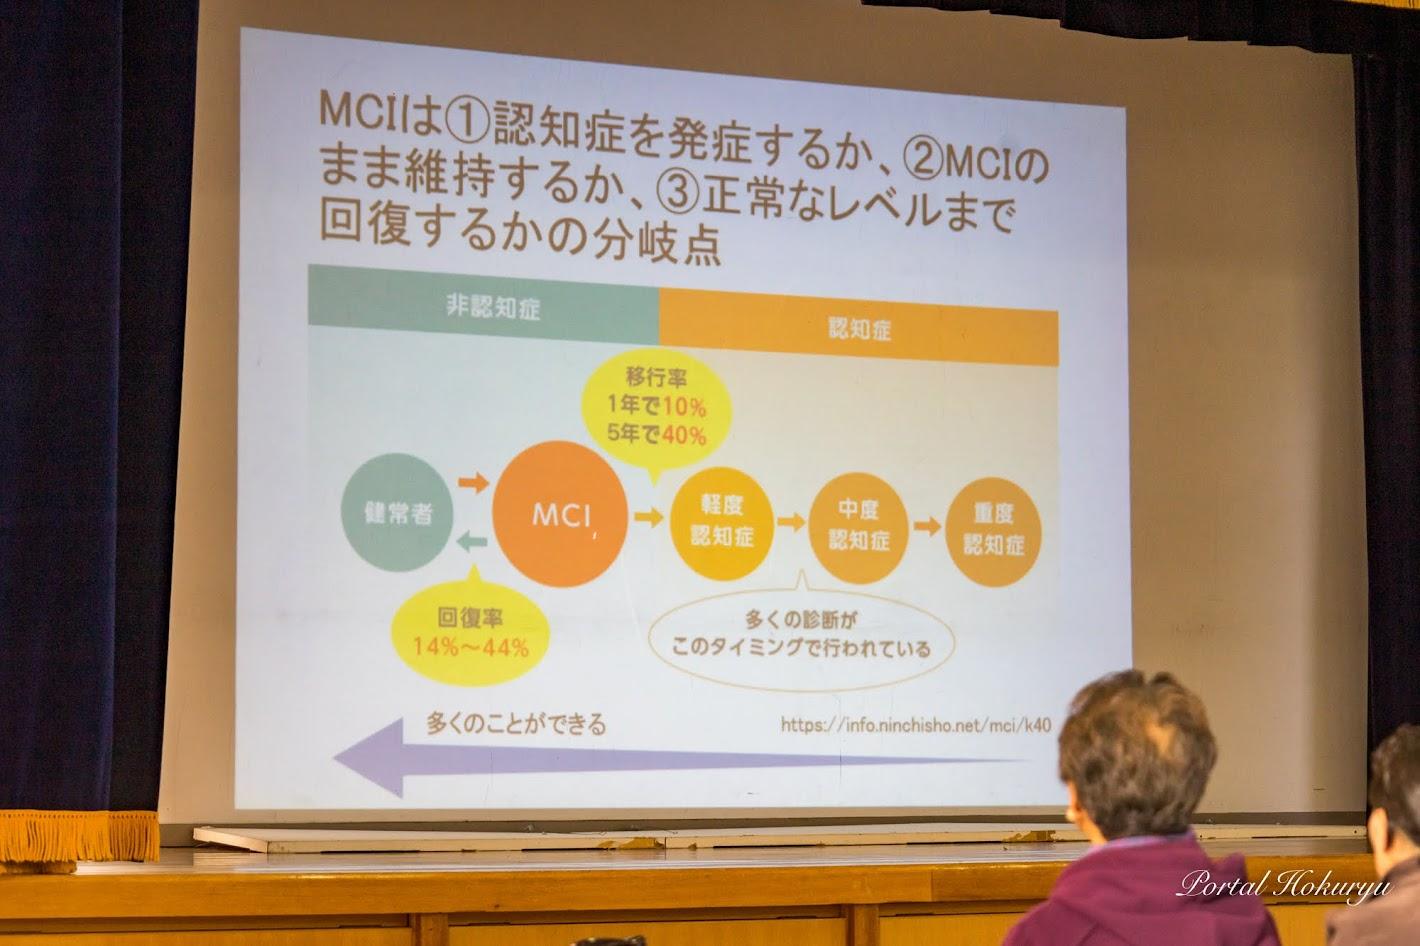 MCIは ① 認知症を発症するか、② MCIのまま維持するか、③ 正常なレベルまで回復するかの分岐点